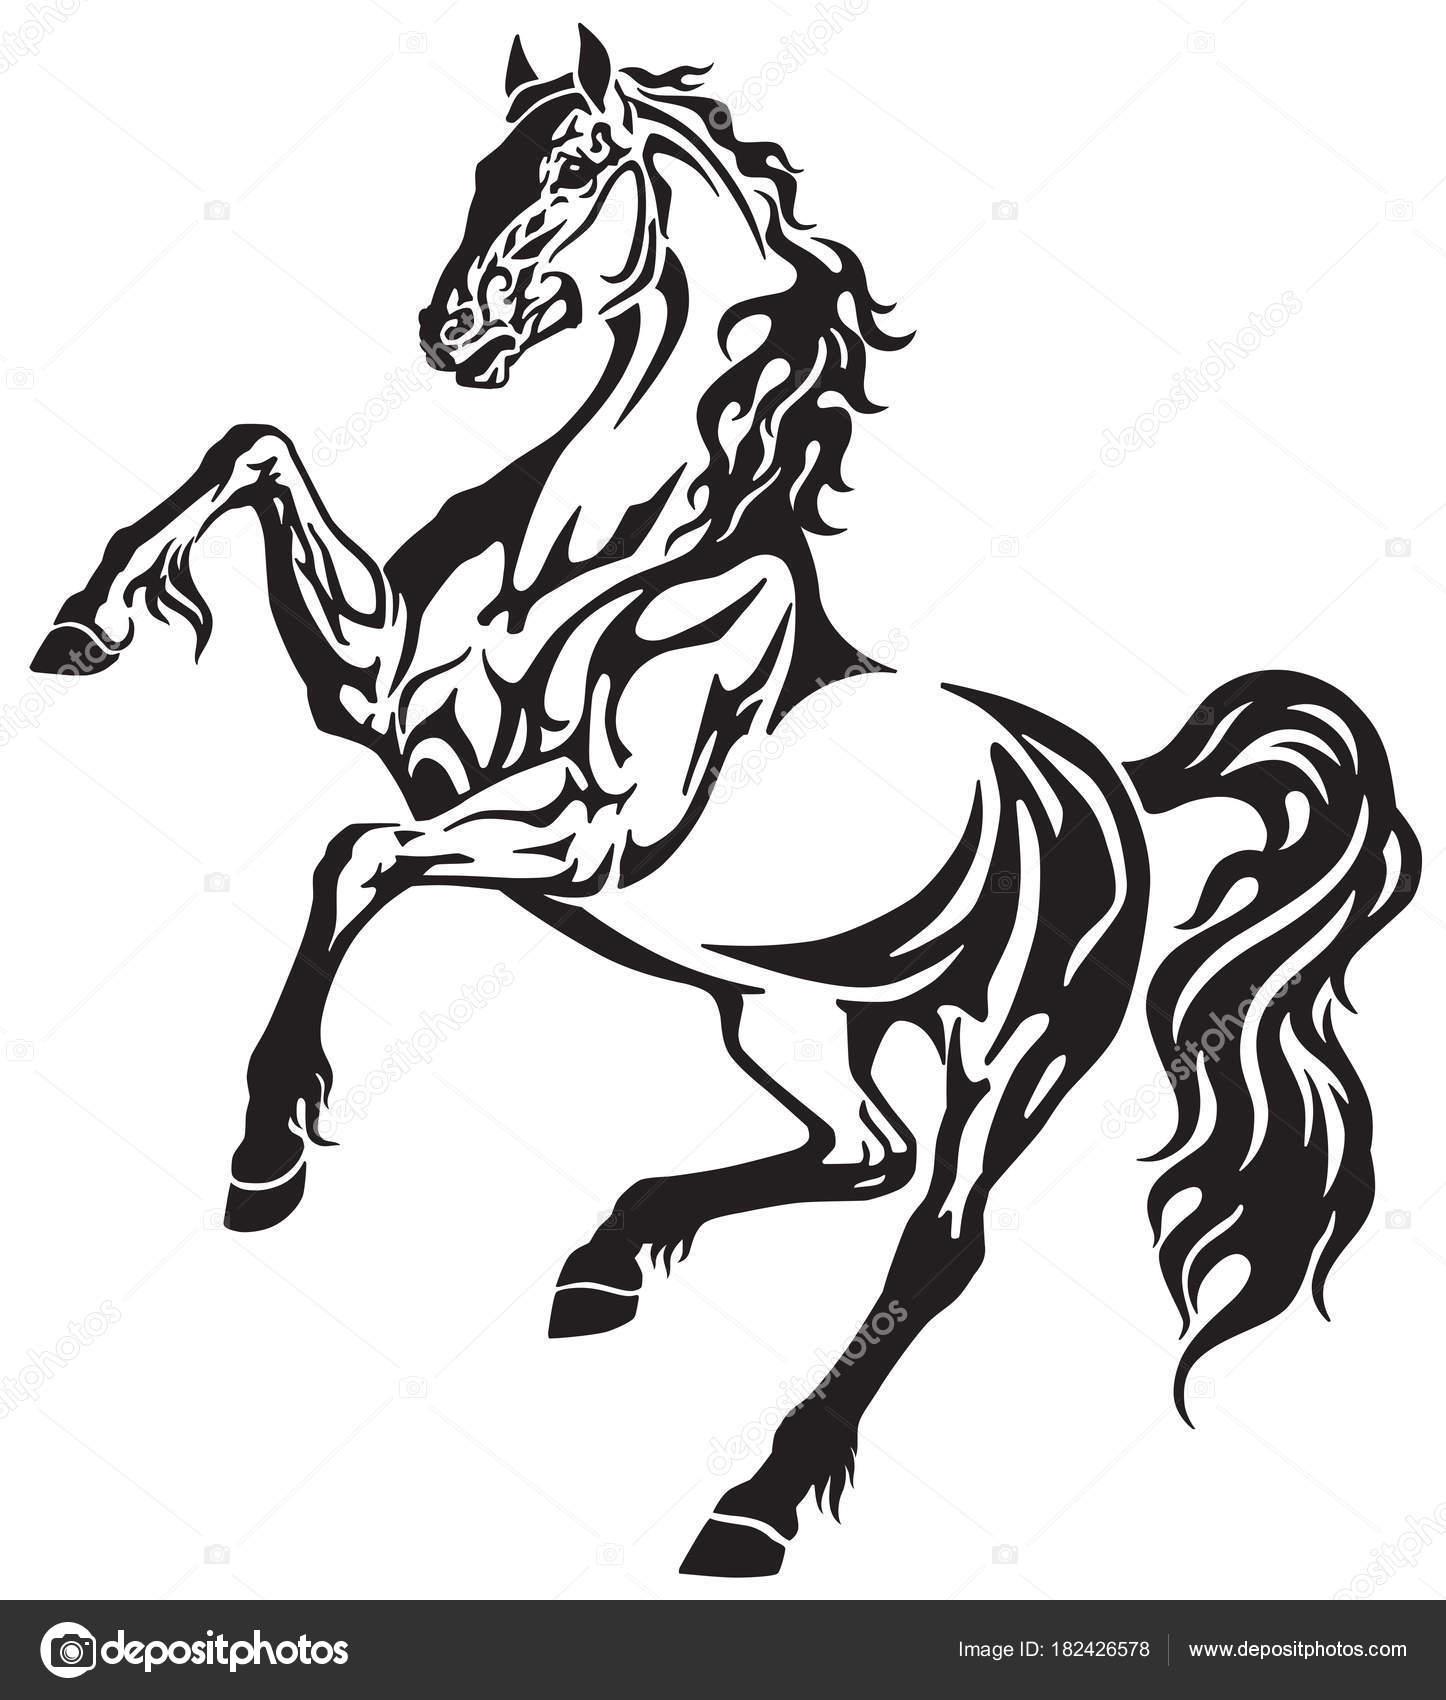 Horse Rearing Tattoo Horse Stallion Rearing Free Movement Elegant Tribal Tattoo Style Black Stock Vector C Insima 182426578